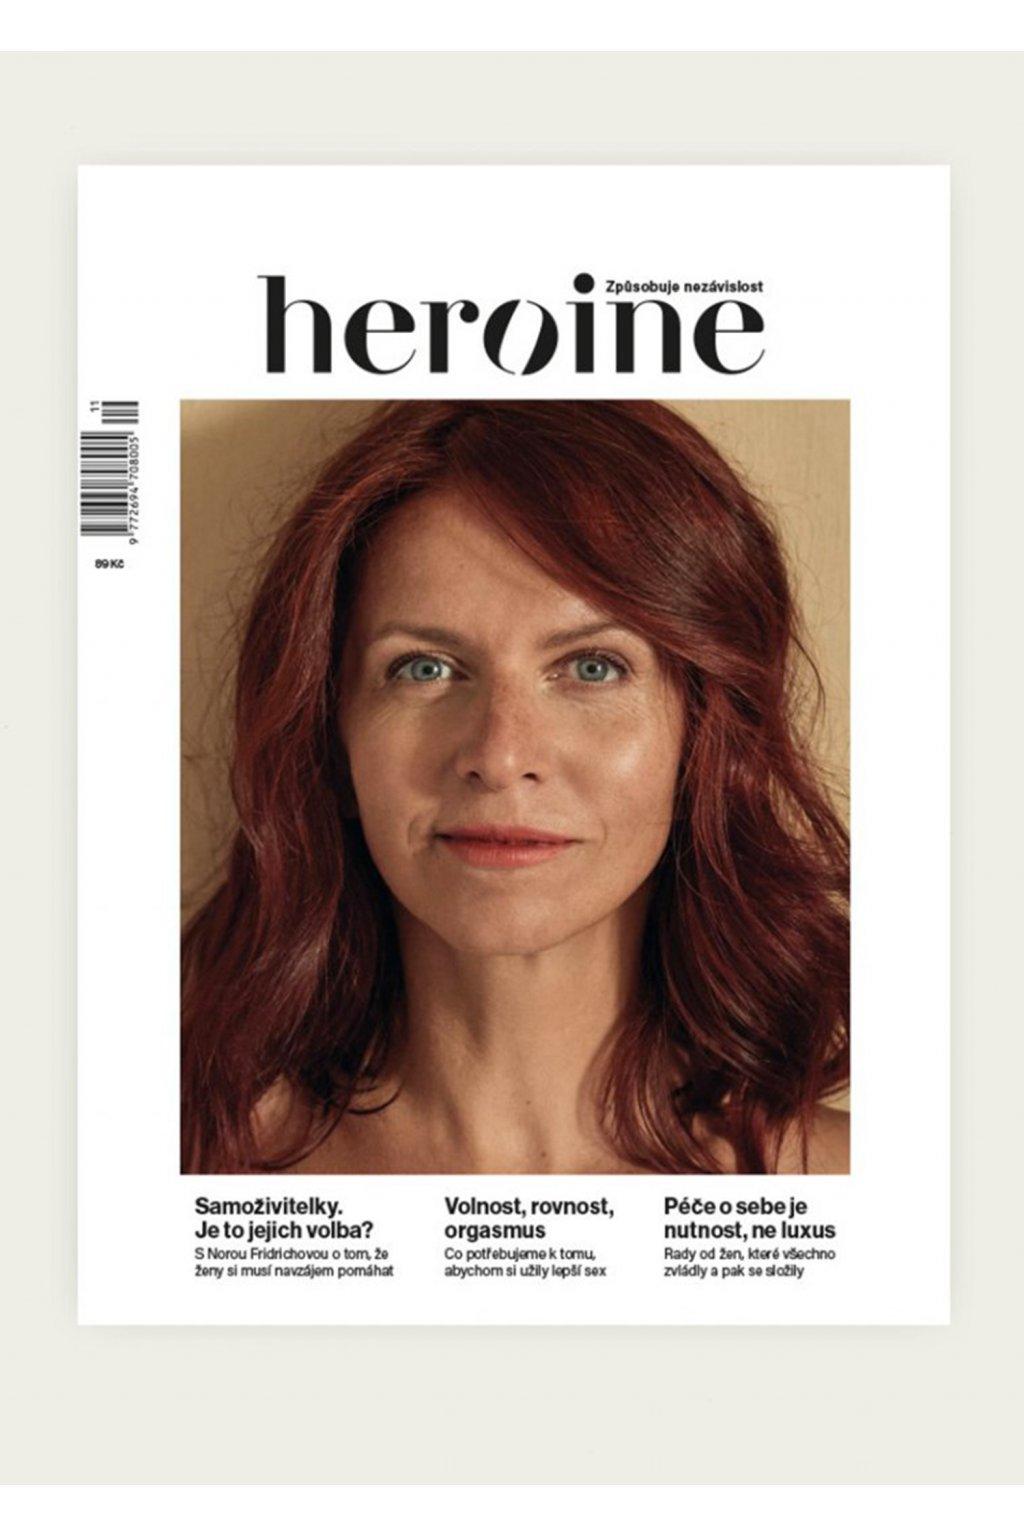 heroine nora puravida